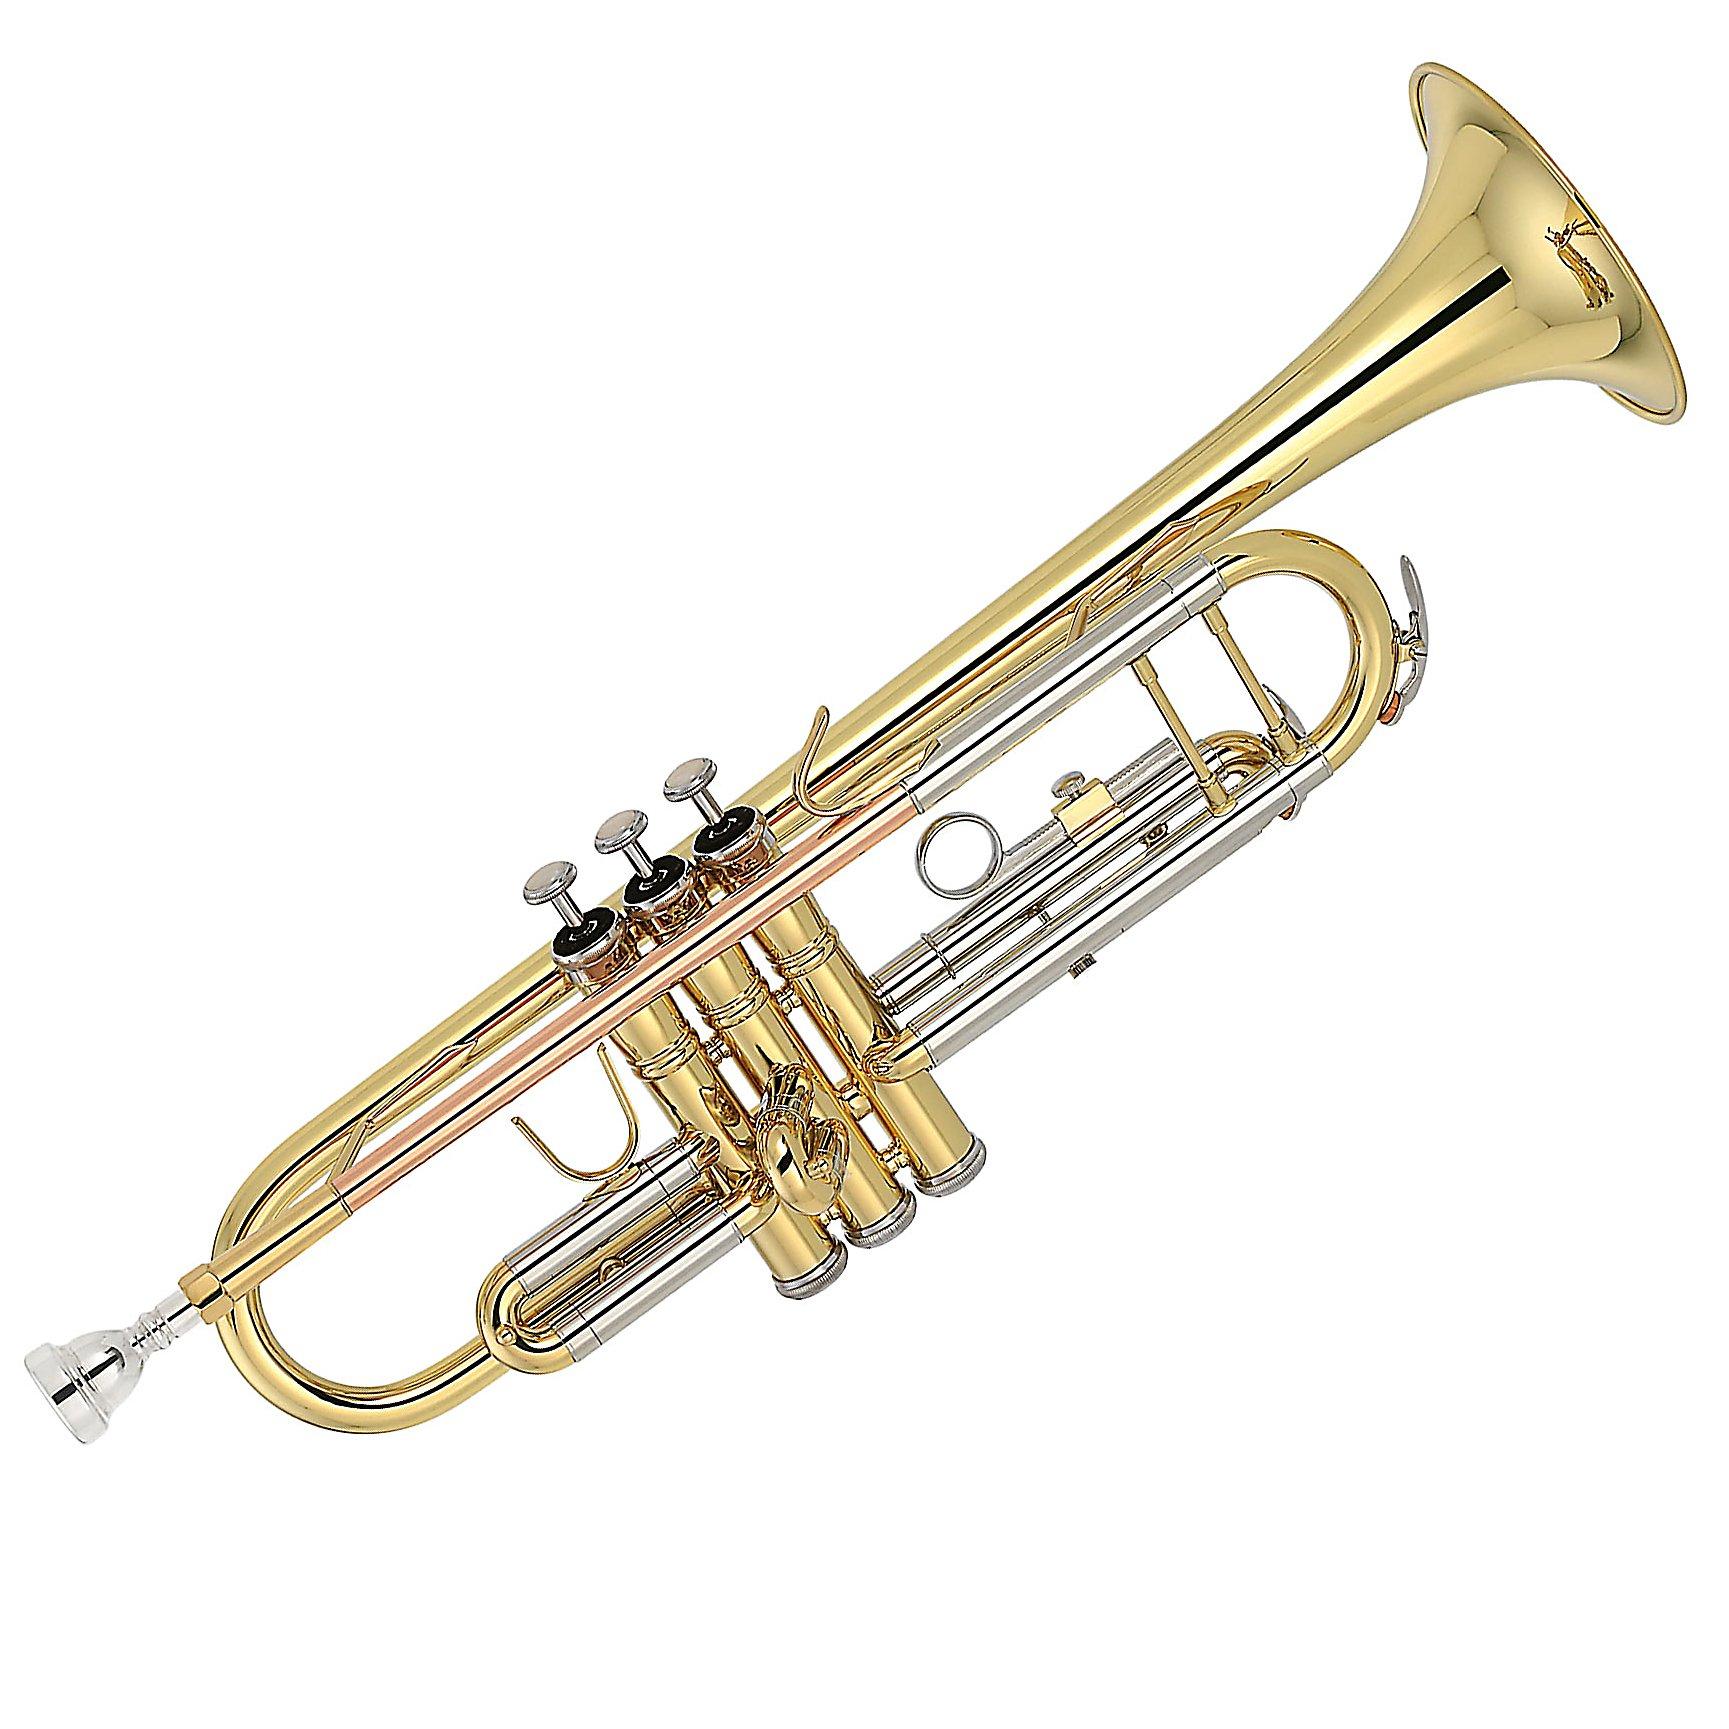 Kaizer TRP-2000LQRC 2000 Series Double Braced B Flat Bb Trumpet - Gold by Kaizer